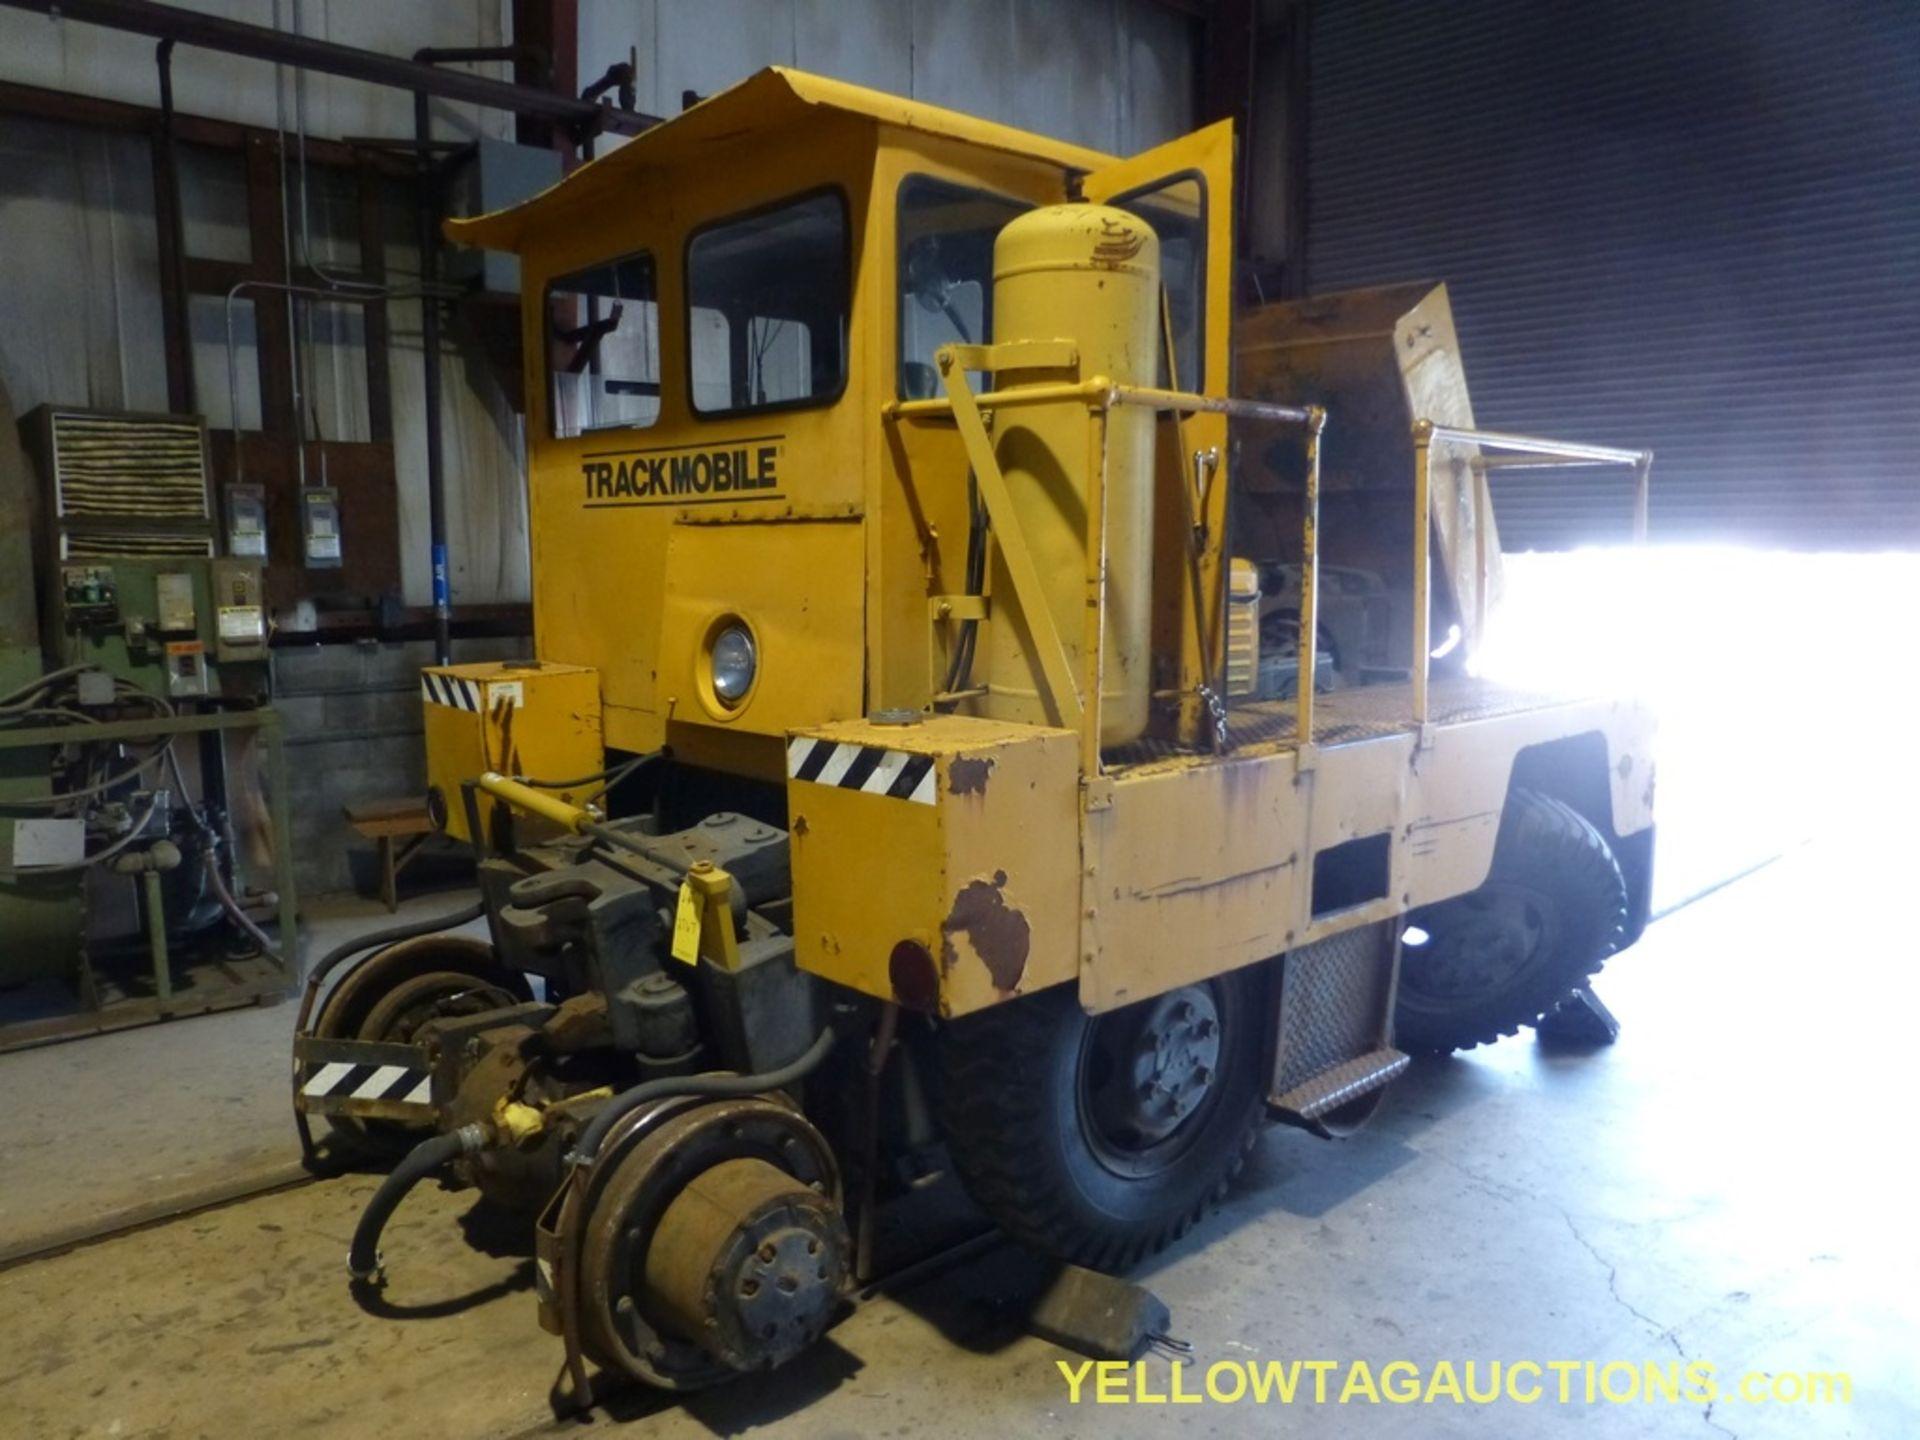 Track Mobile Rail Car Mover | Model No. 7TM; Bad Tie Rod